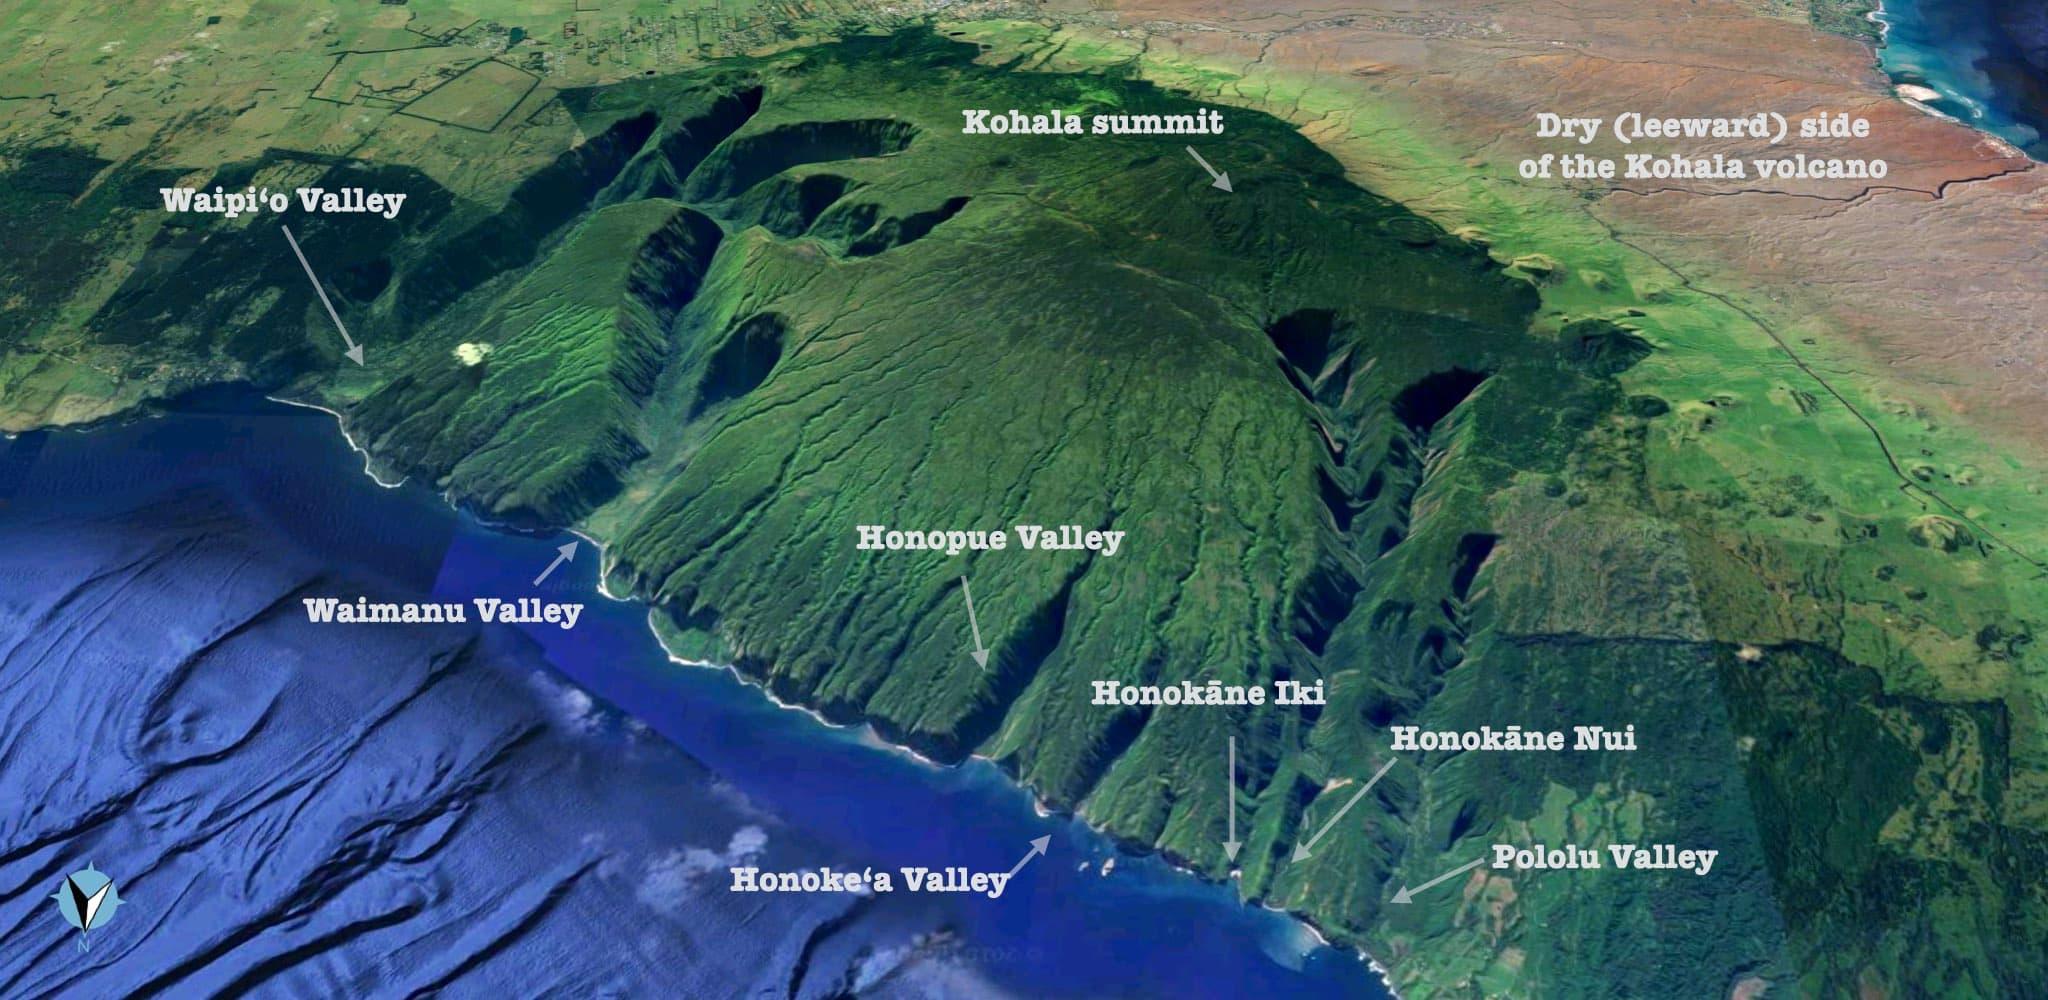 Kohala Hawaii Map.Pololu Valley The Lookout The Hike And The Black Sand Beach